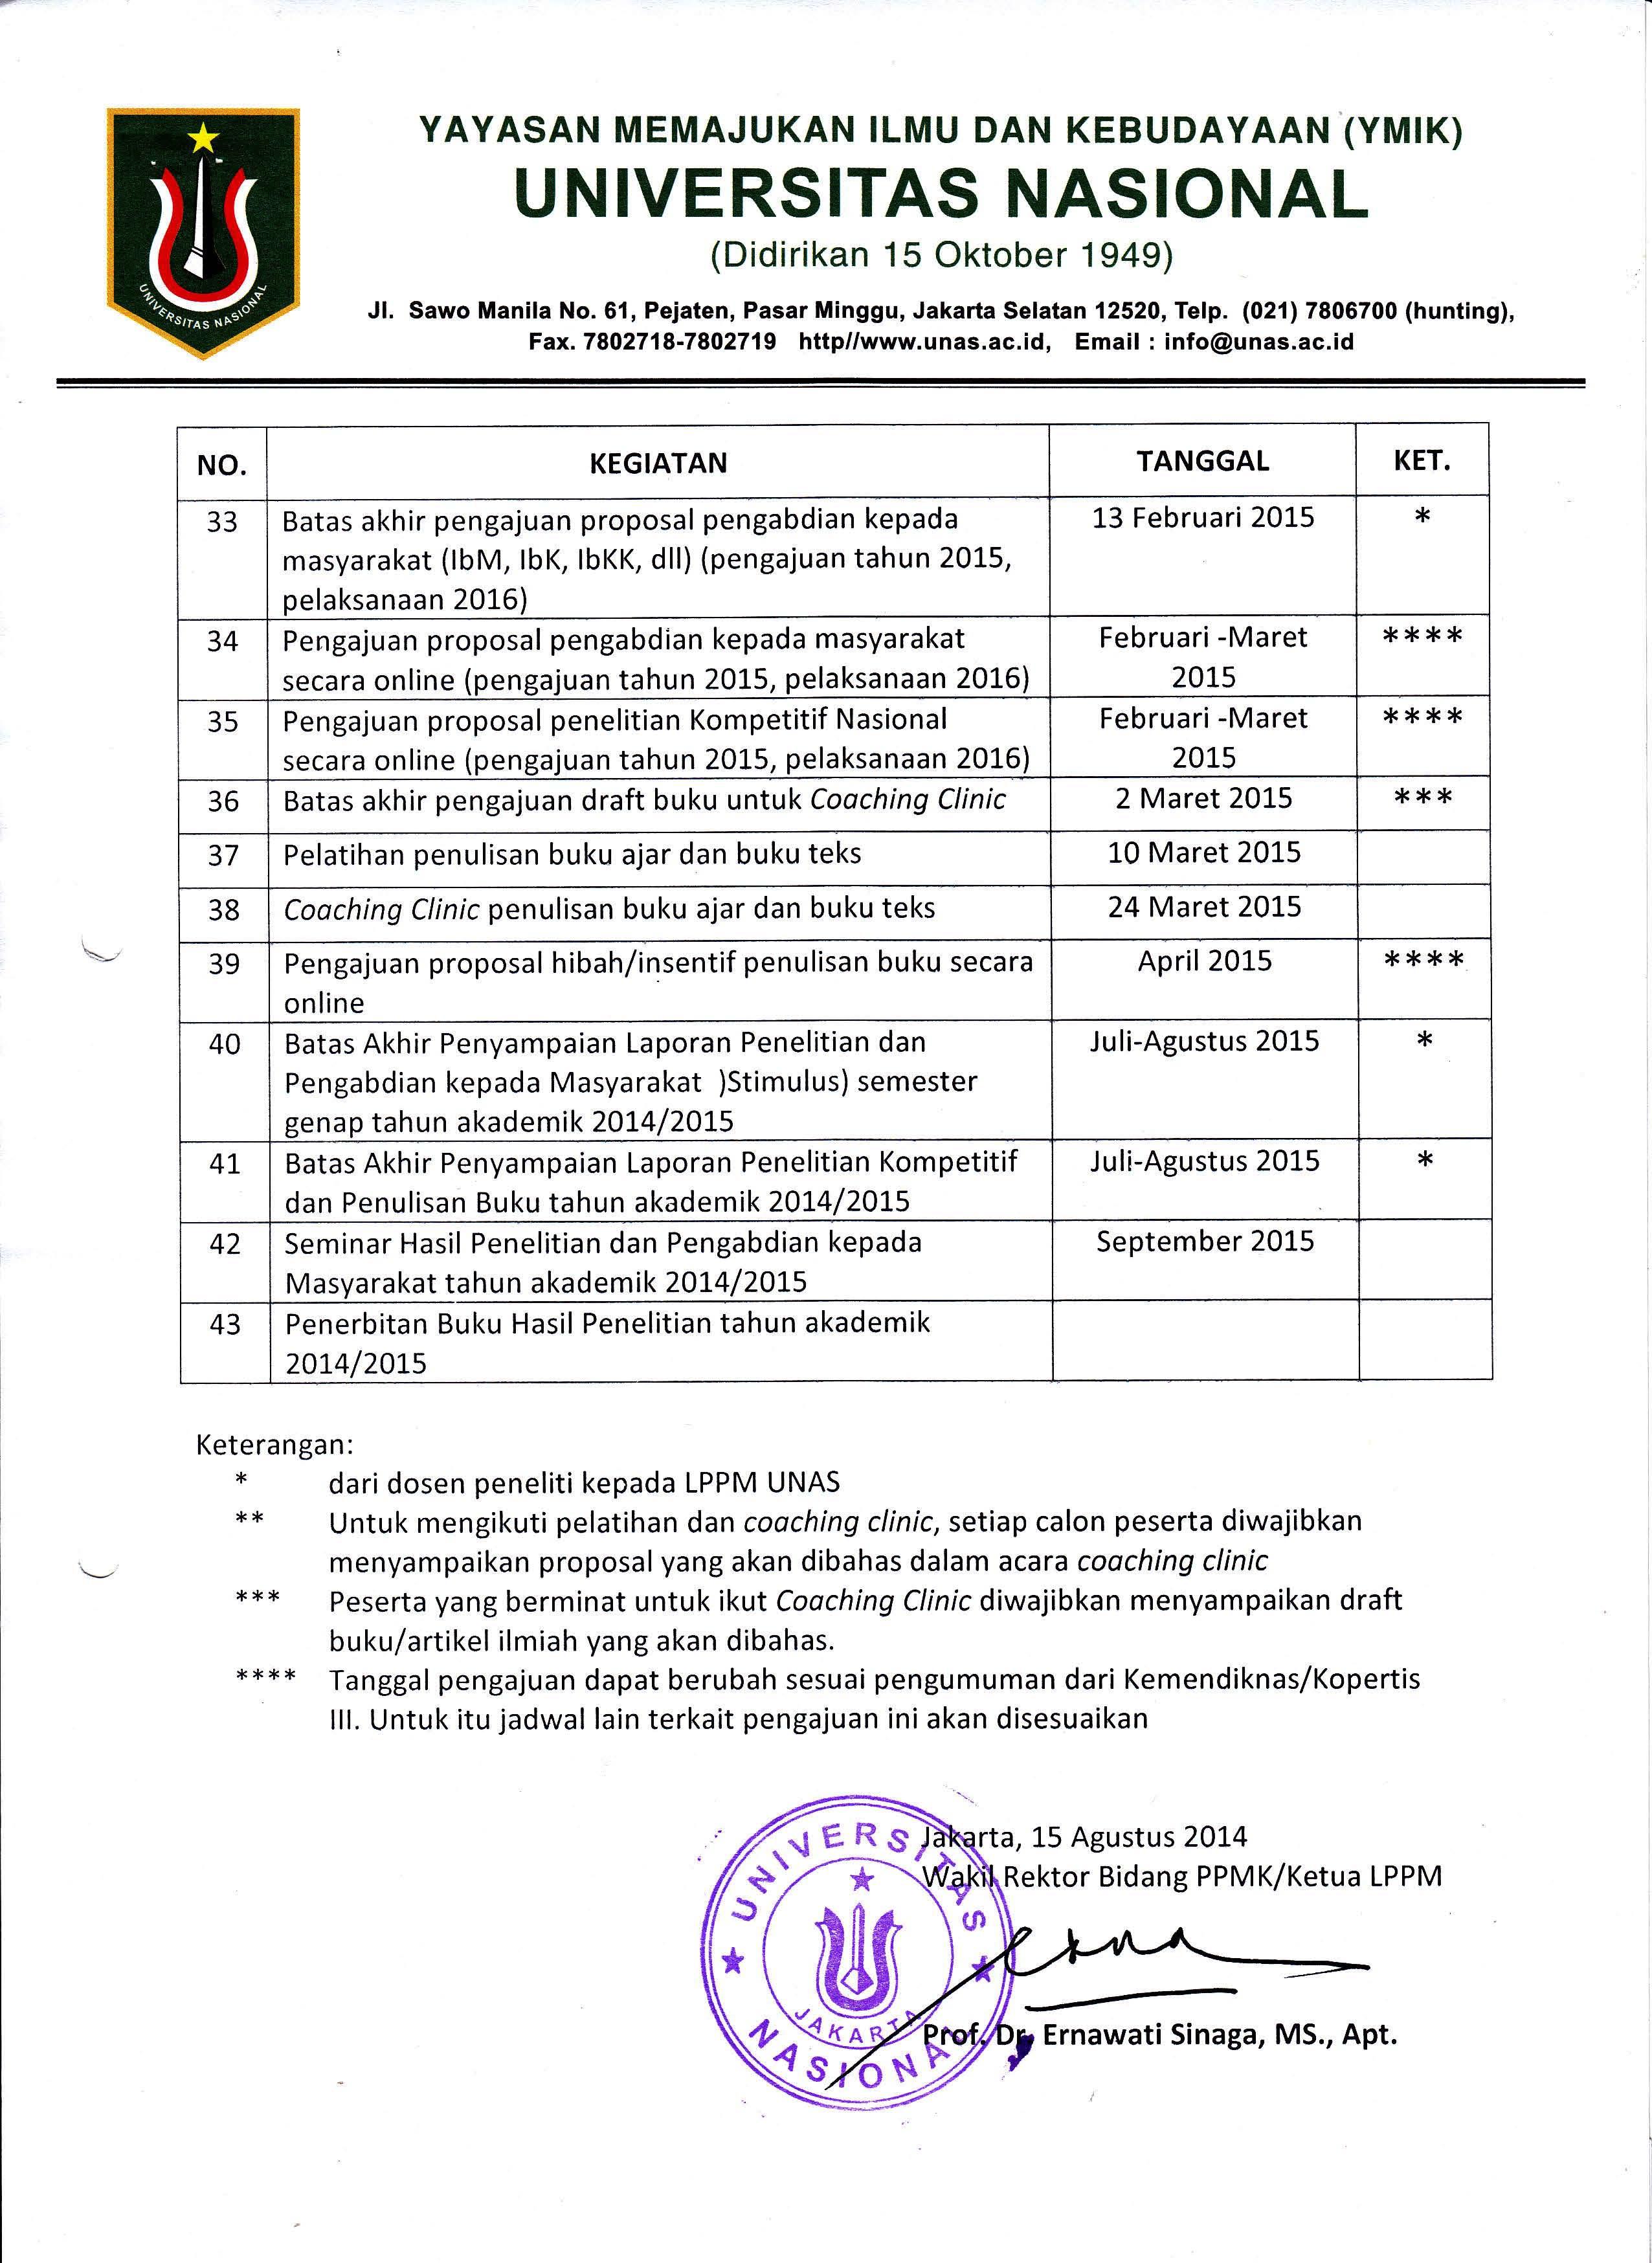 kALENDER ppm-2014-2015-LENGKAP_Page_3